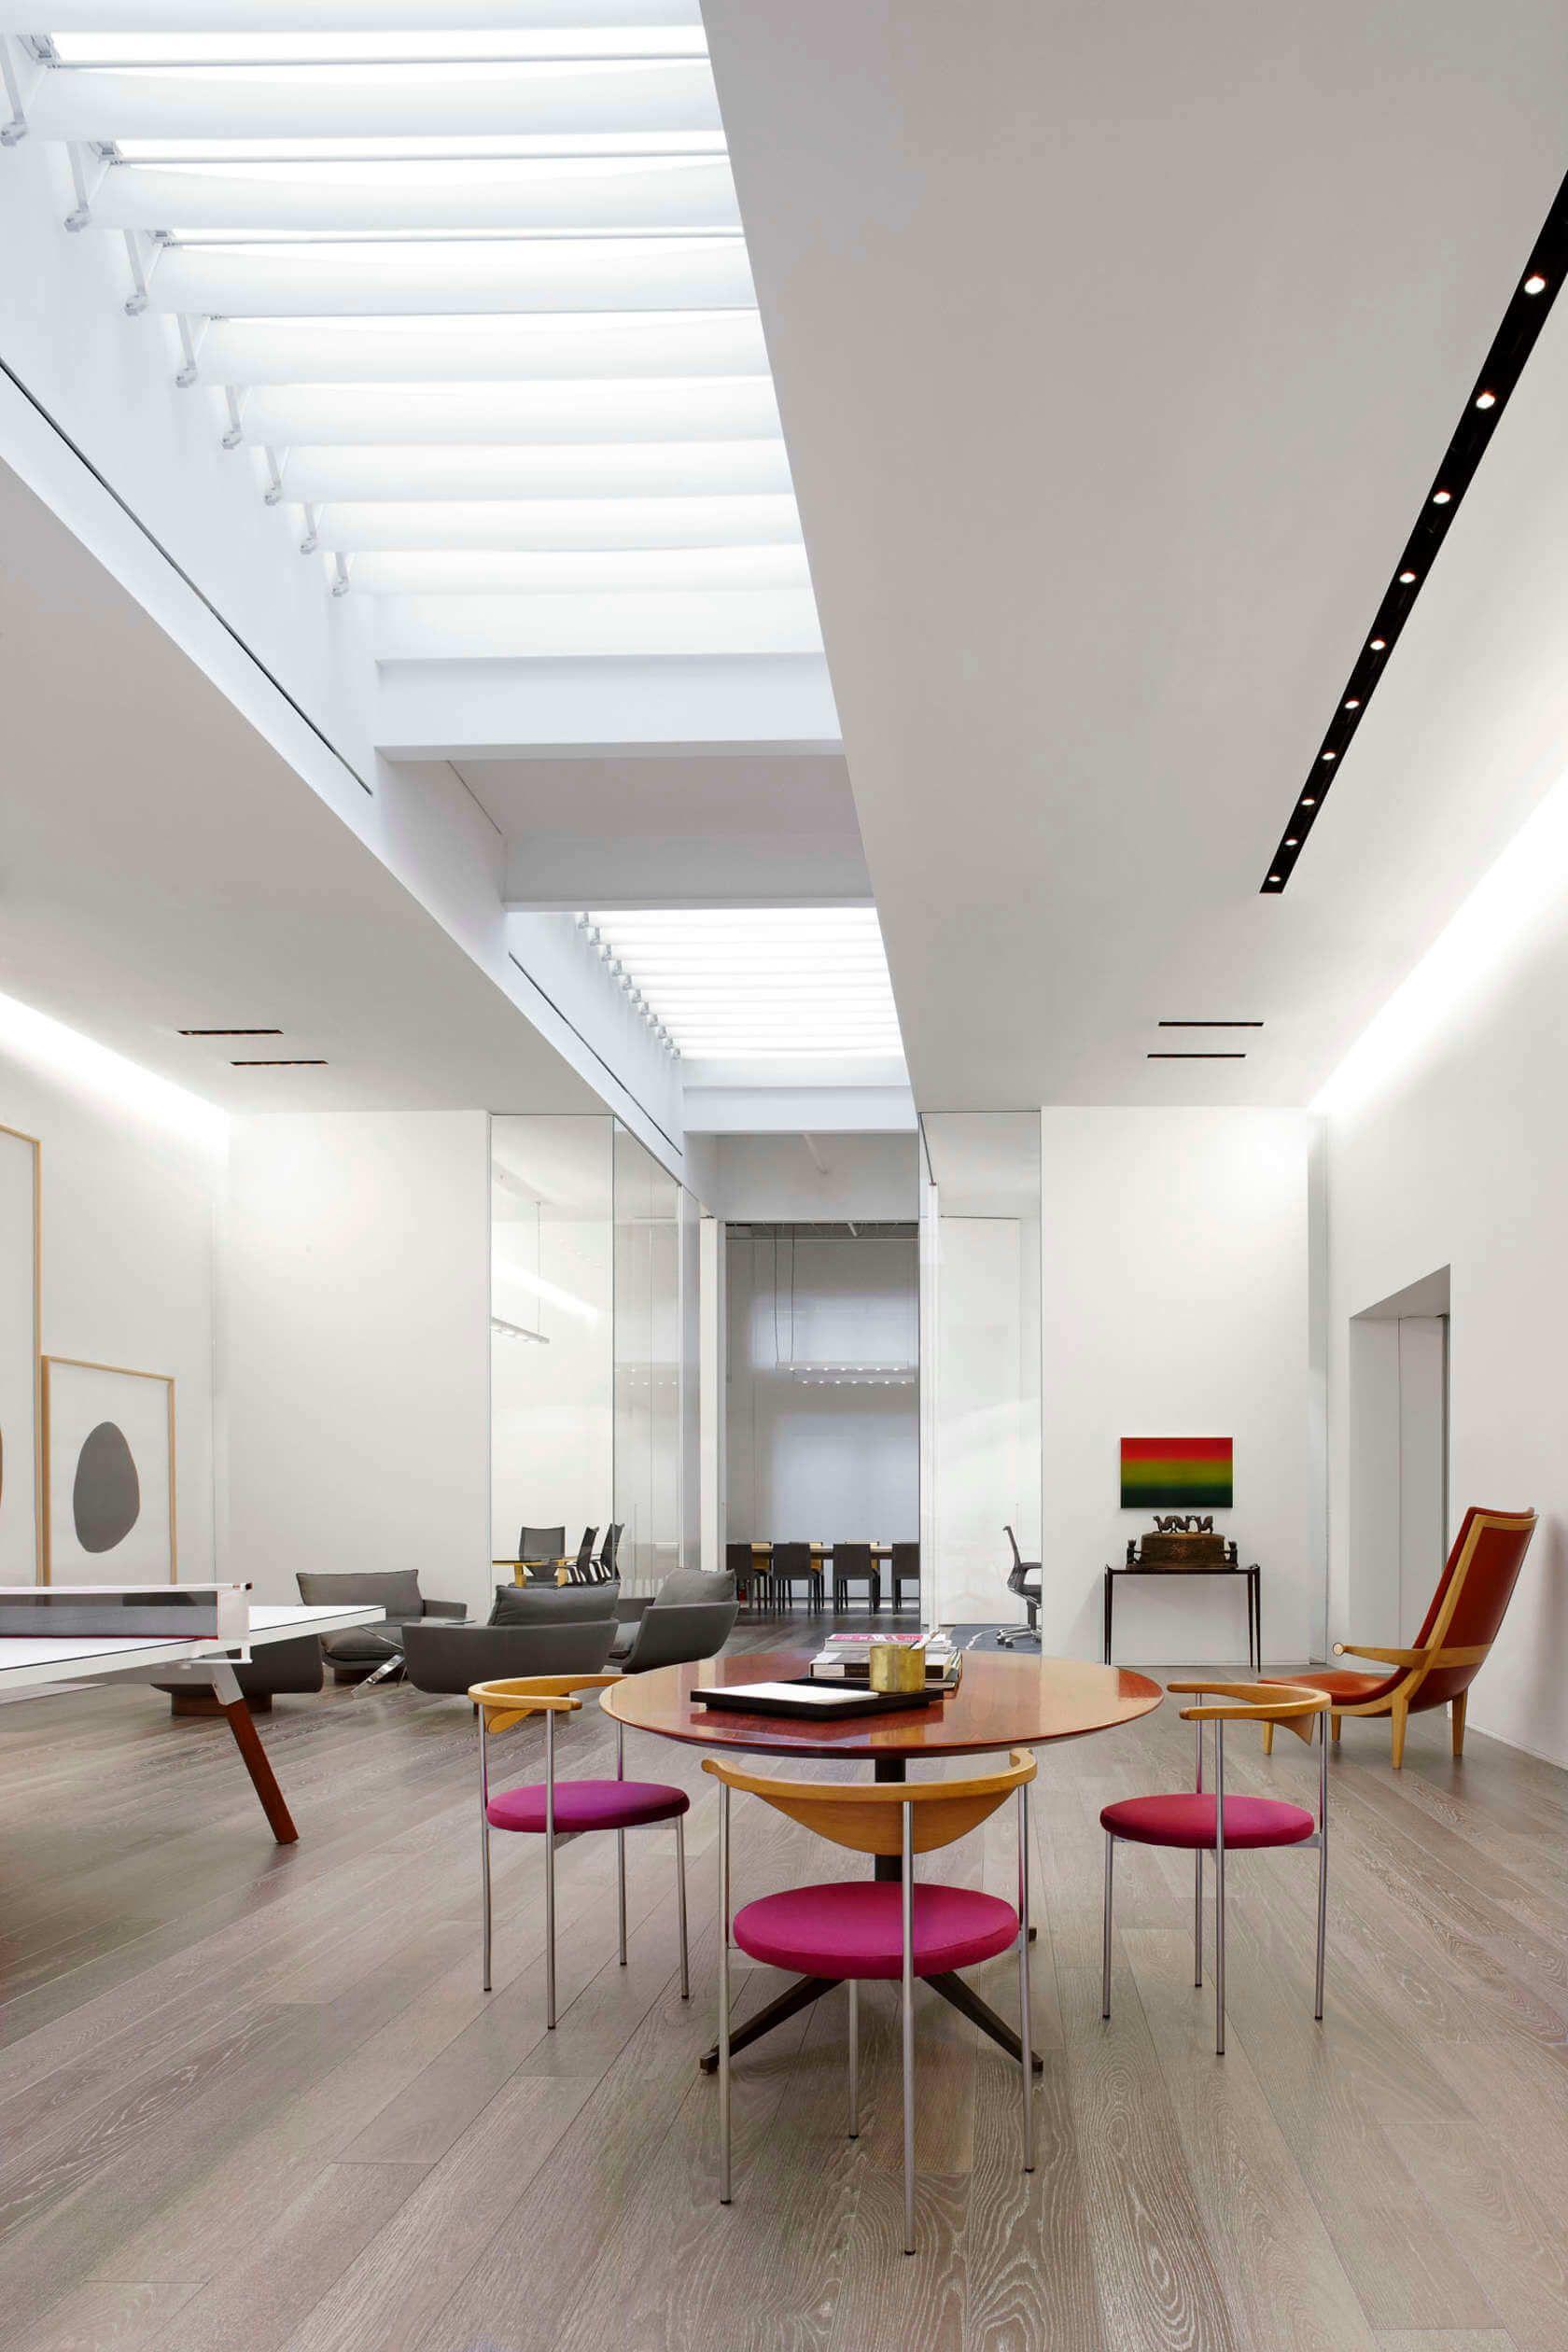 Ypto studio by yabu pushelberg shelter me home yabu pushelberg interior studio for Interior decorating courses toronto